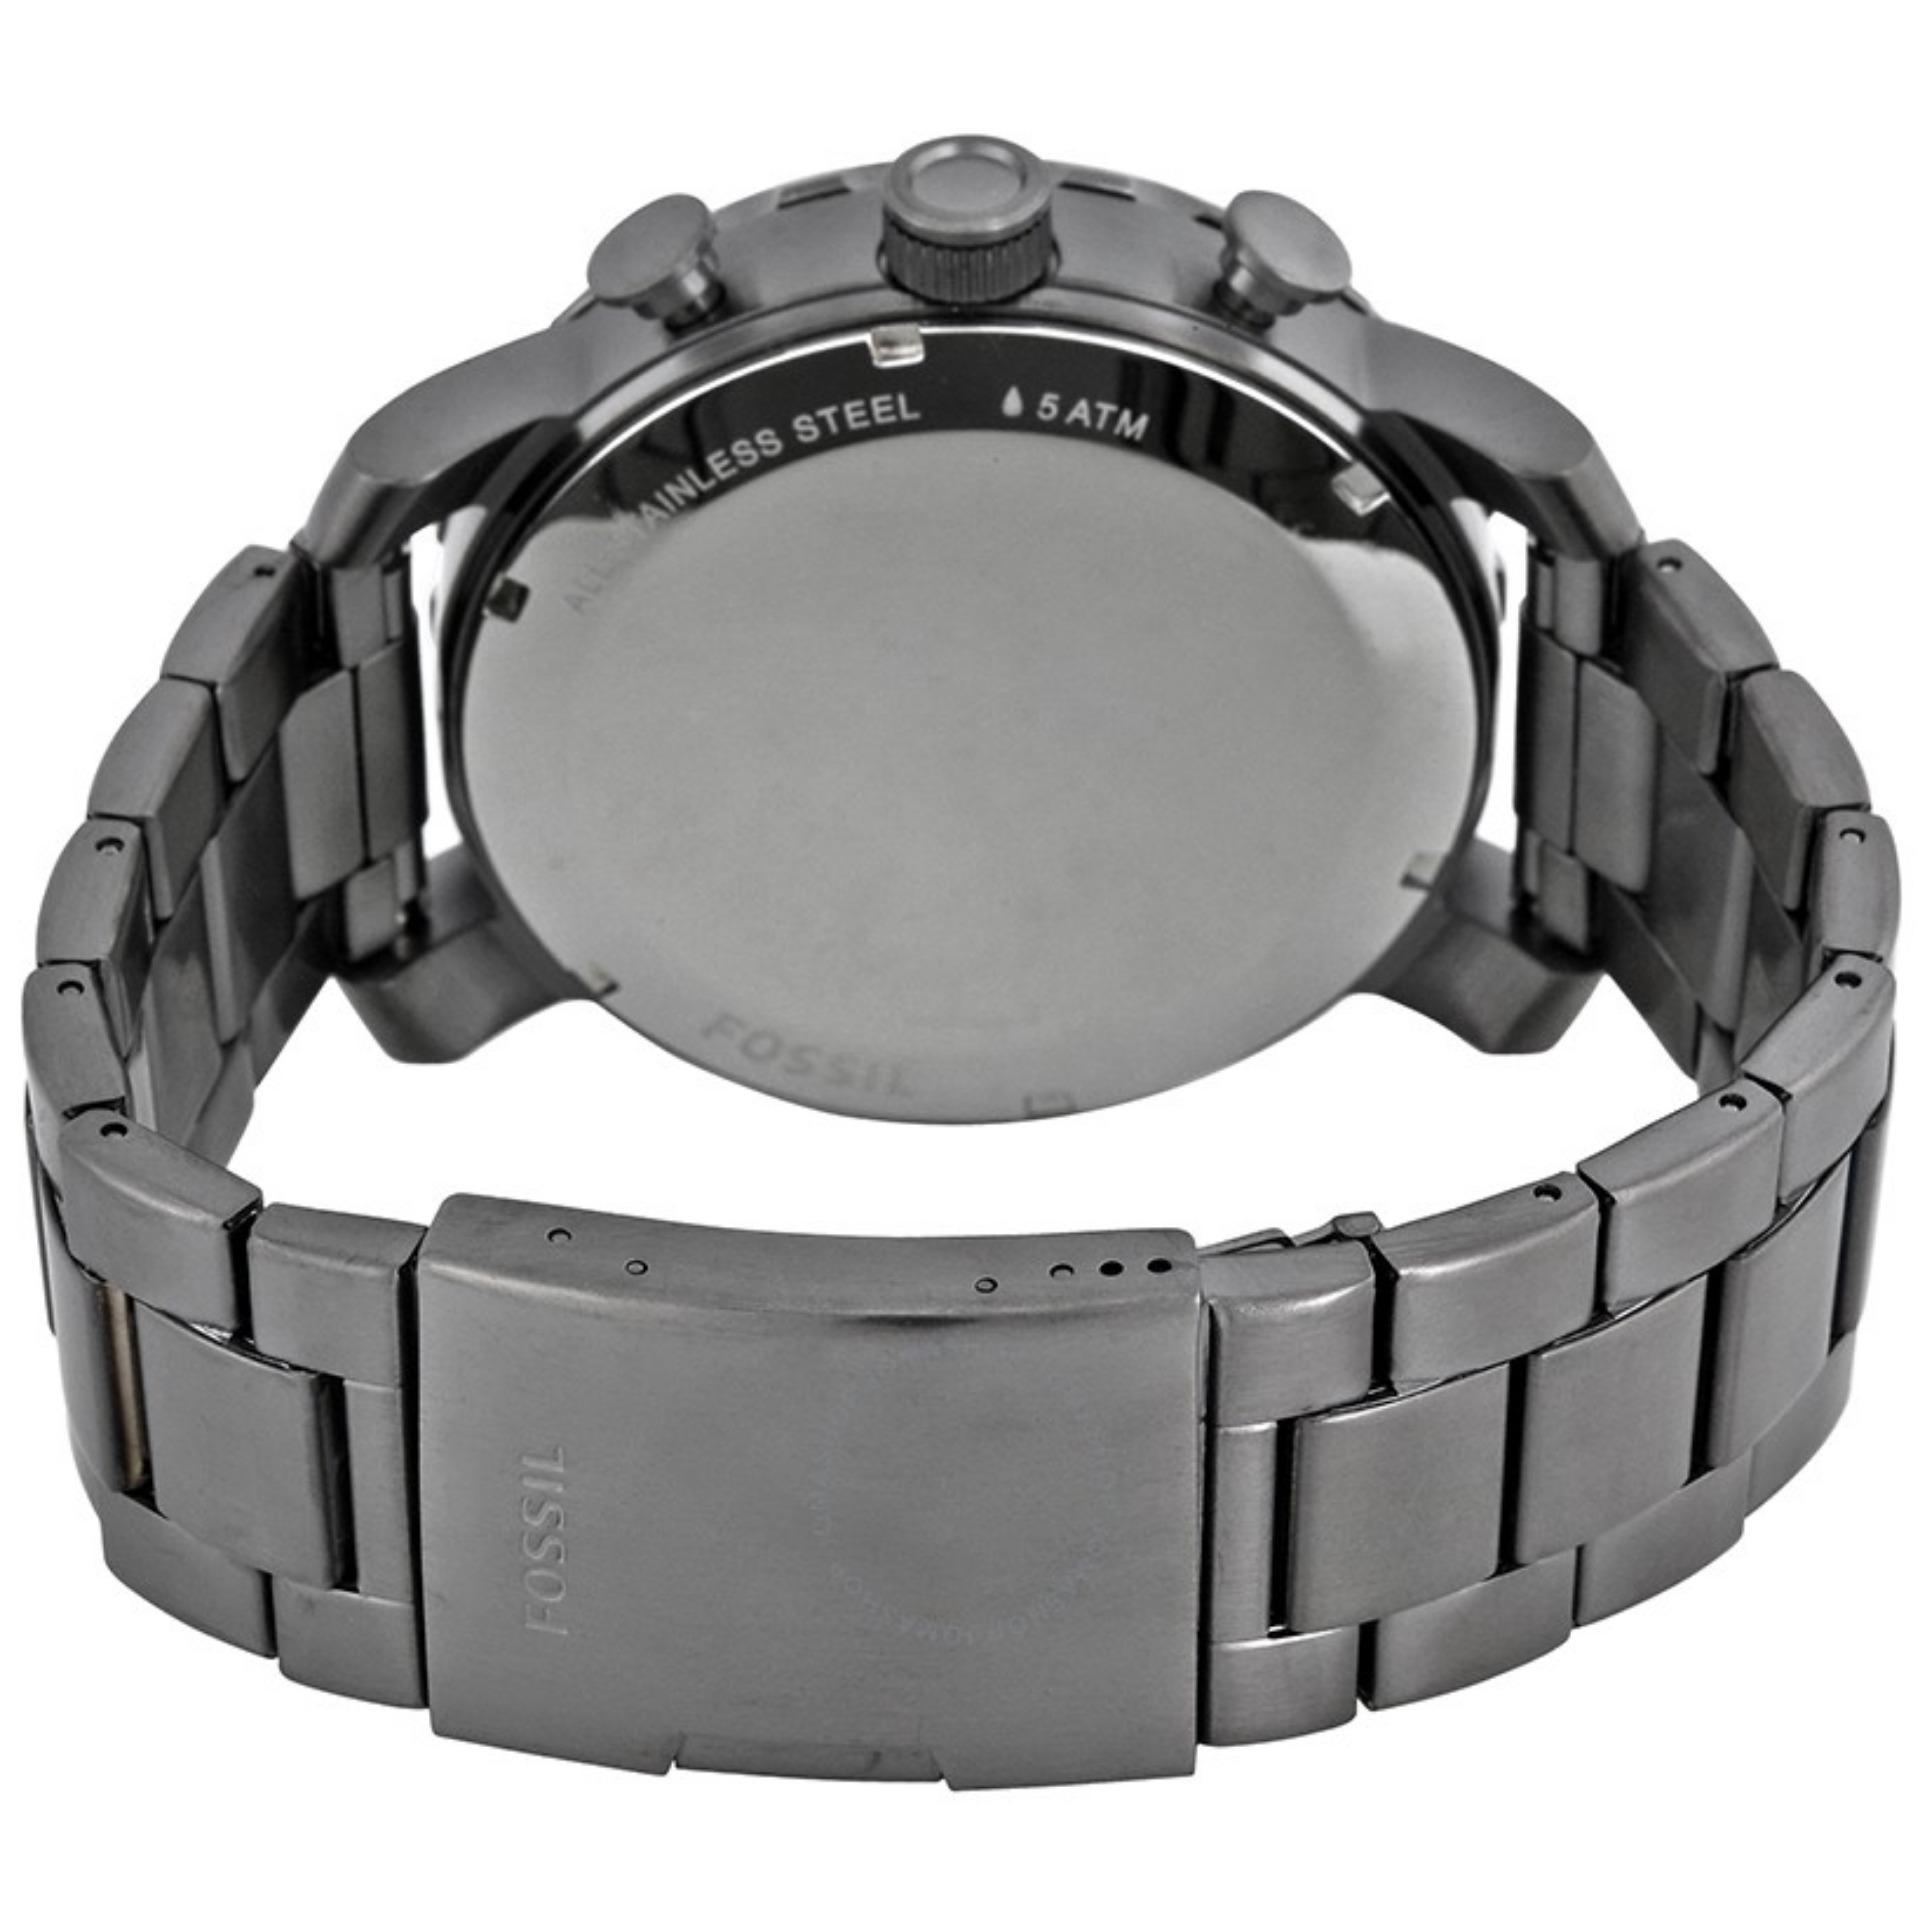 Fossil Jam Tangan Pria Jr1401 Nate Chronograph Black Jr1494 Stainless Steel Bracelet Hitam Jr1437 Smokestainless Watch